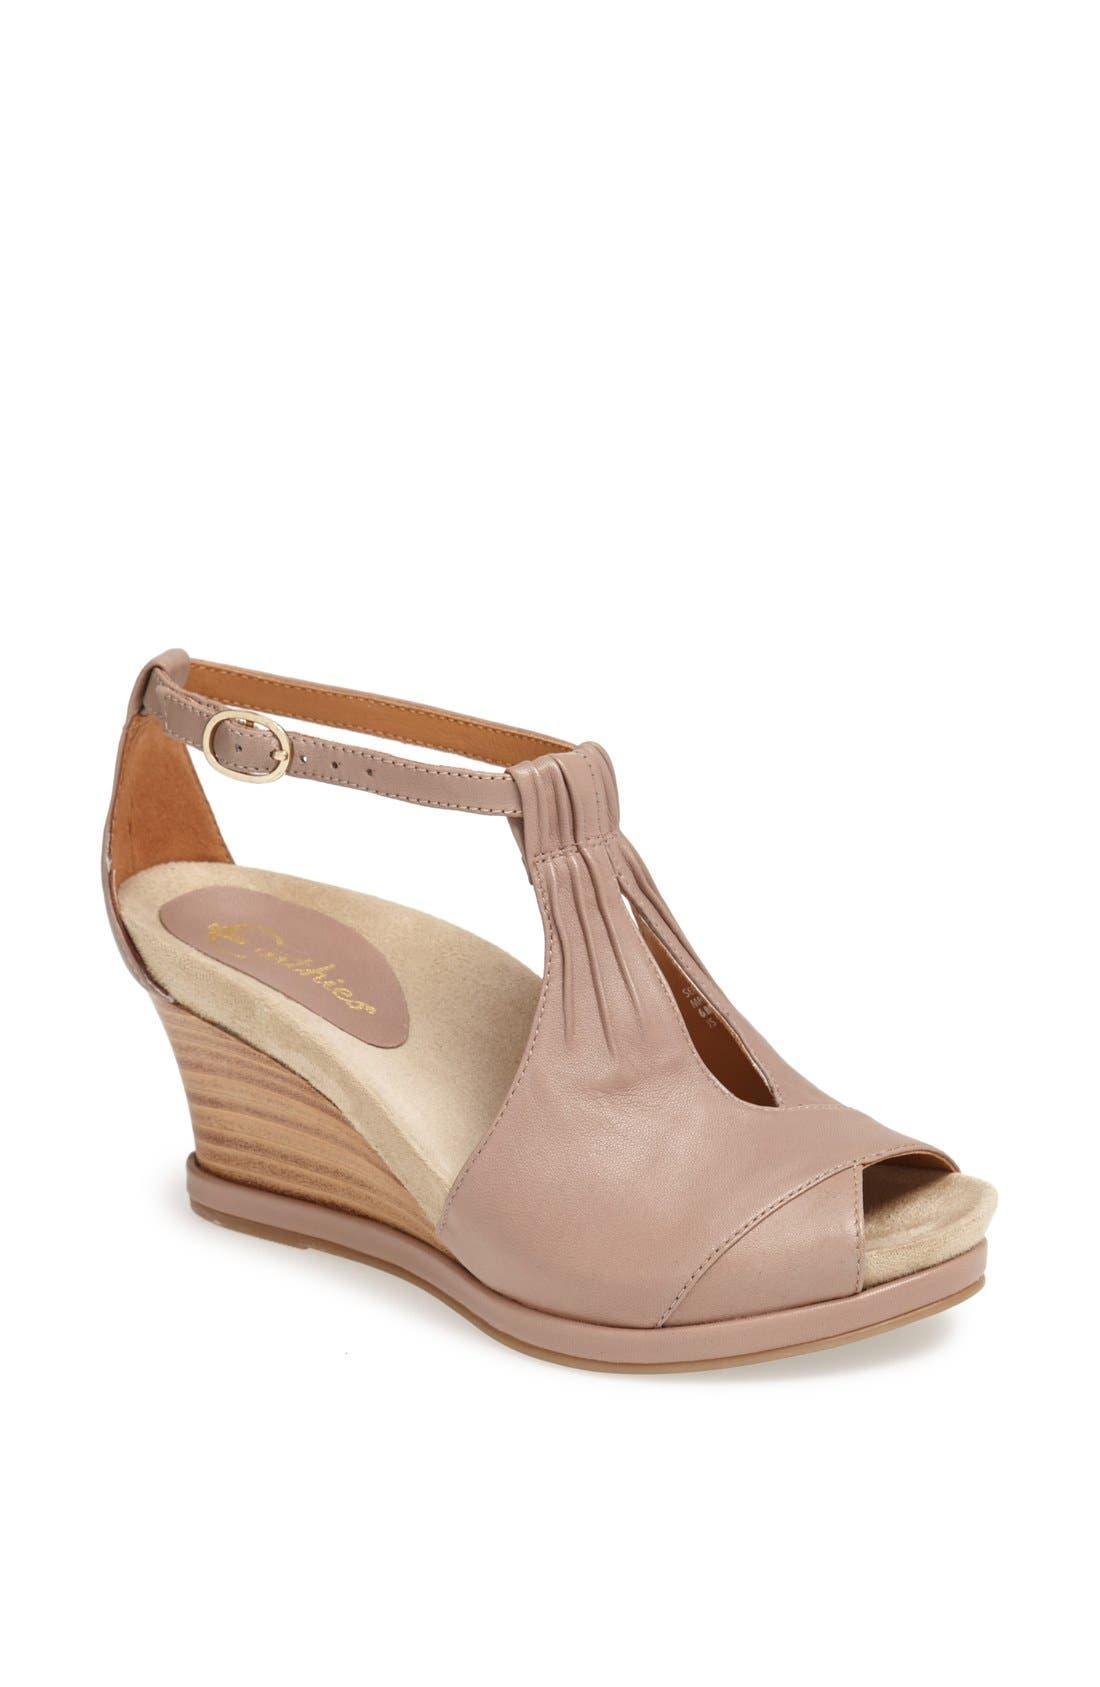 Alternate Image 1 Selected - Earthies® 'Seria' Sandal